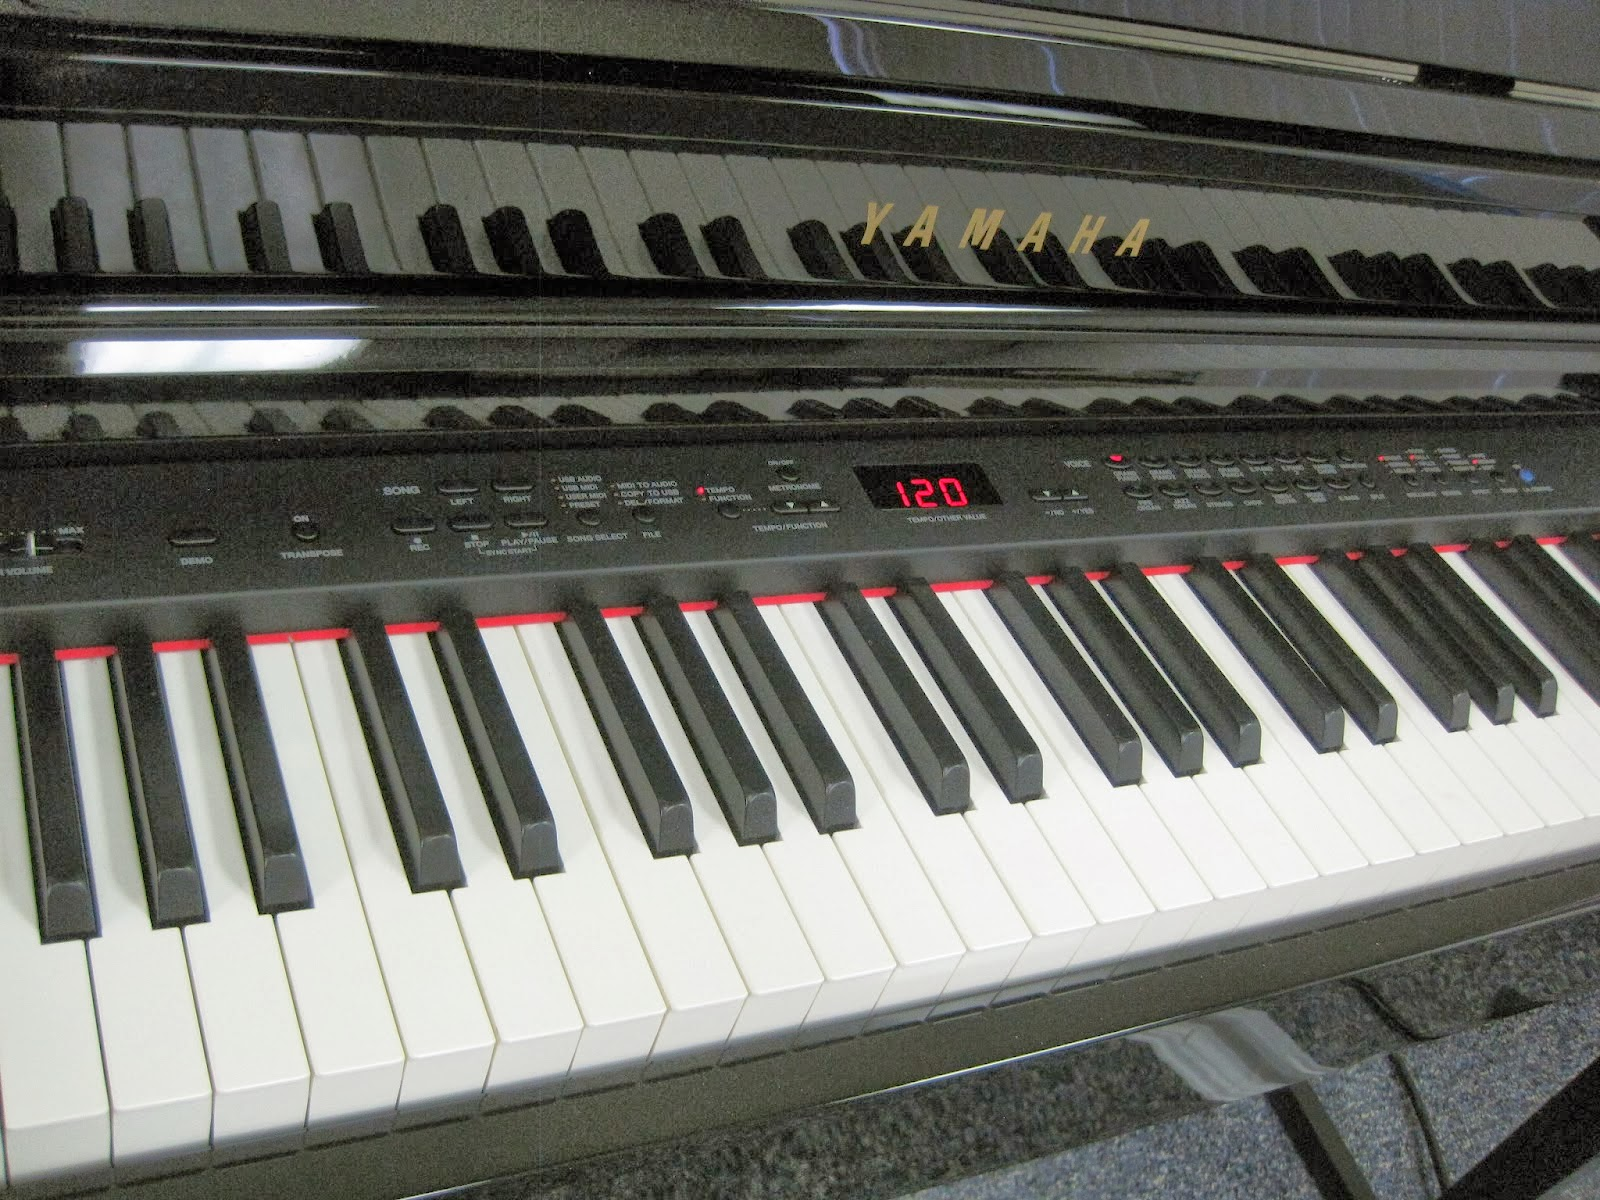 Yamaha Digital Piano Headphone Jack : consumer savvy reviews yamaha clavinova digital pianos the choice for true music makers ~ Hamham.info Haus und Dekorationen